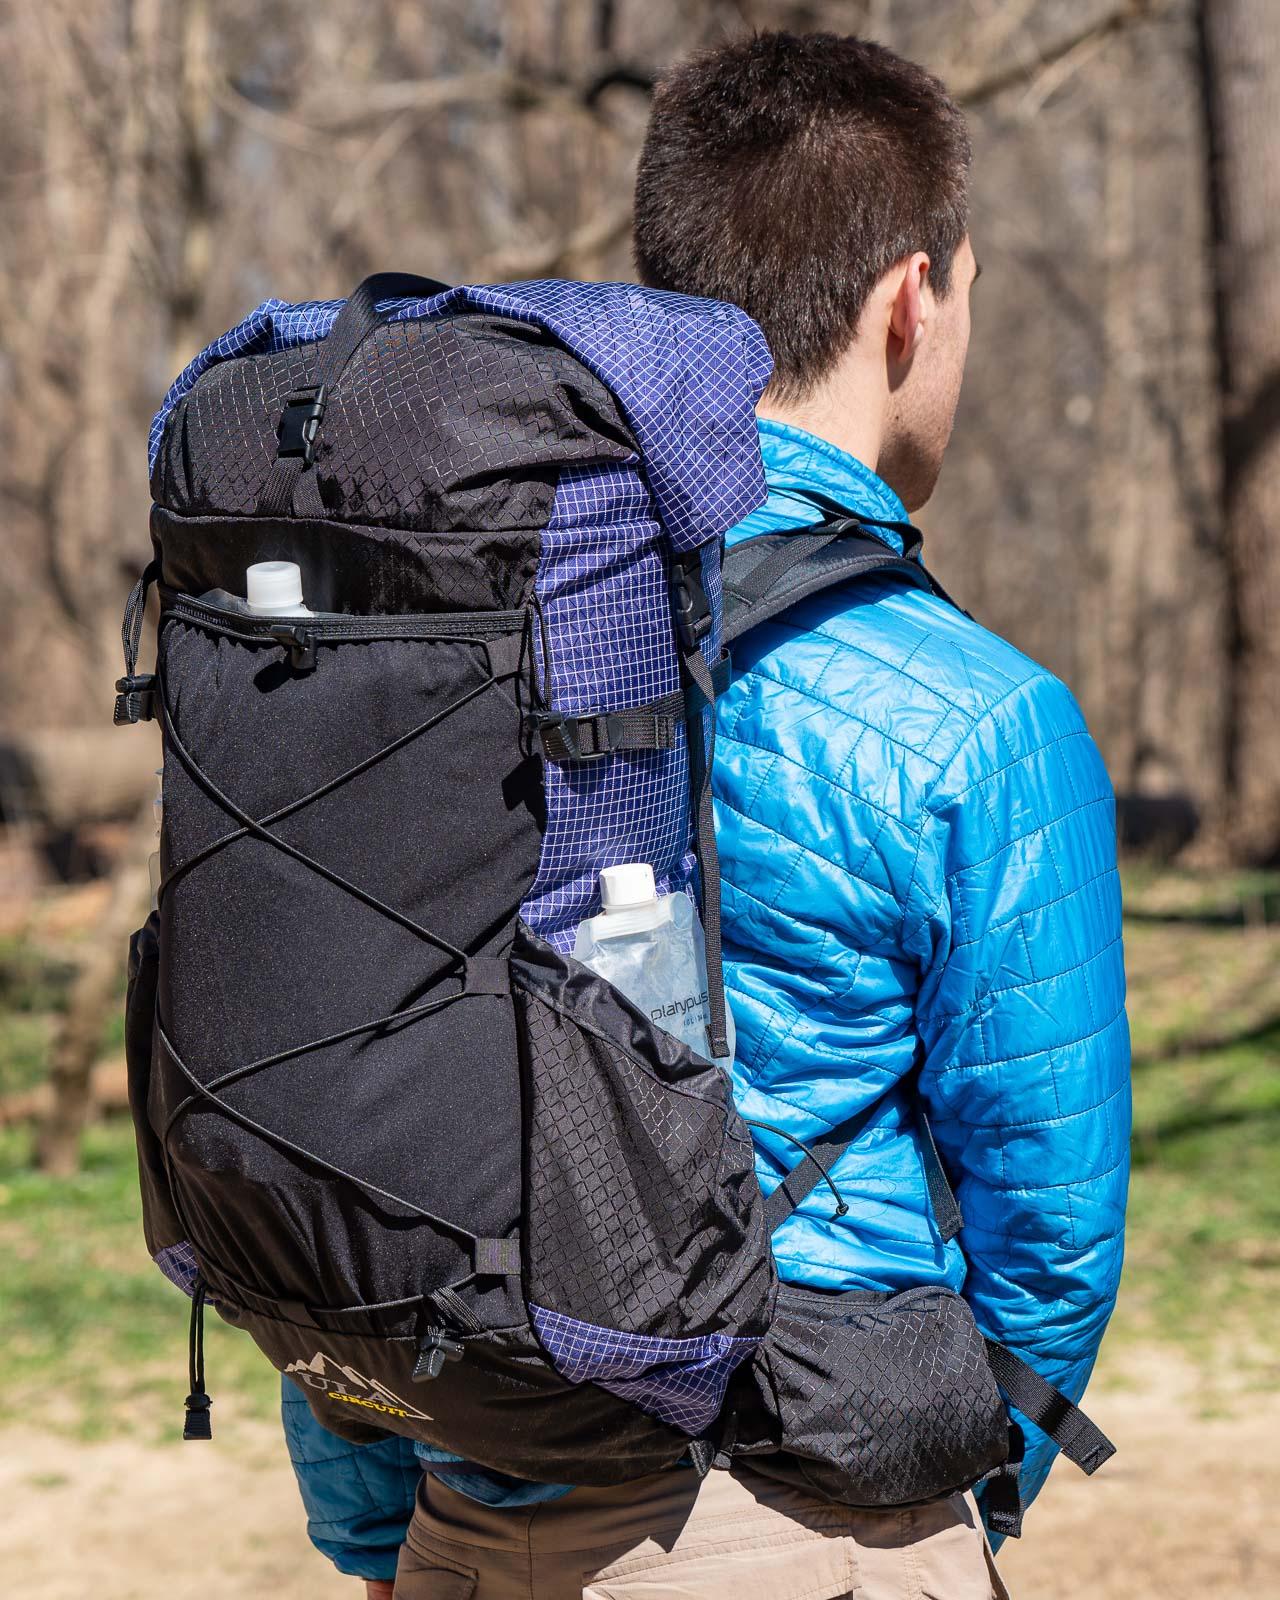 60-Day SOS SV Food Fit Internal Frame Travel Hiking Trekking Camping